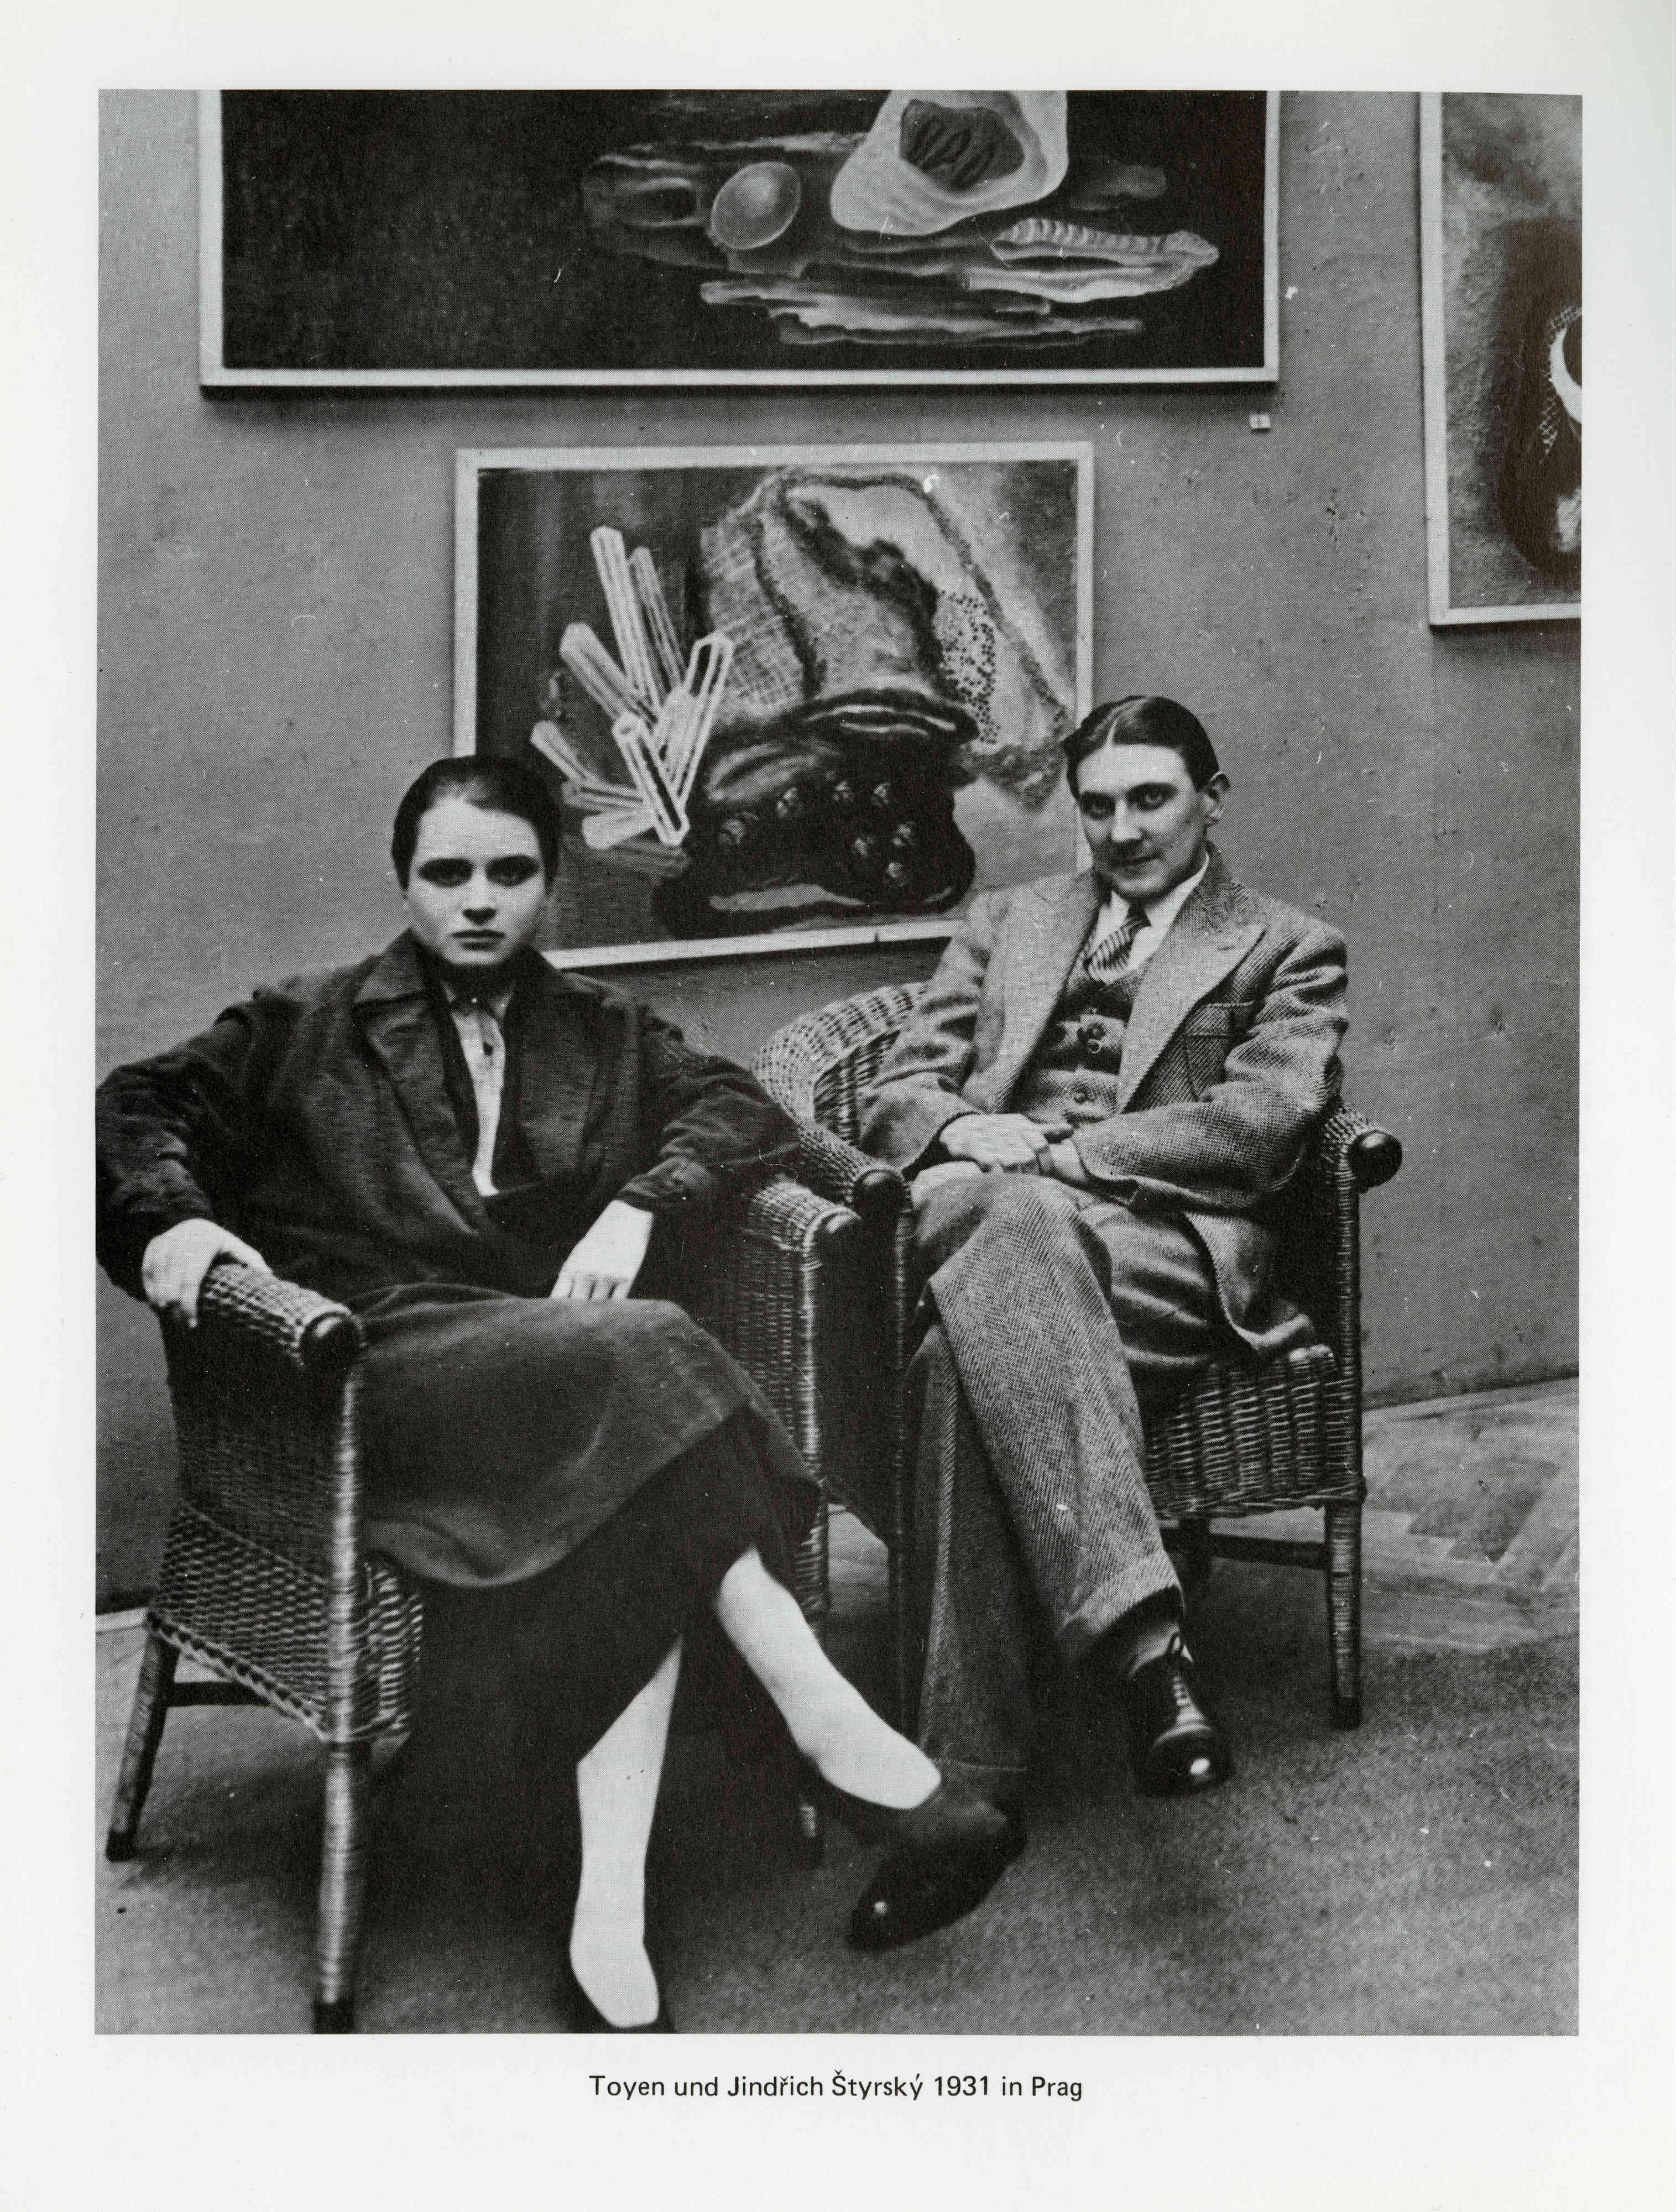 Tšehhi kunstnikeduo Toyen ja Jindřich Štyrský 1931. aastal Prahas artifitsialistliku maalikunsti taustal. Foto: Jiři Hampl